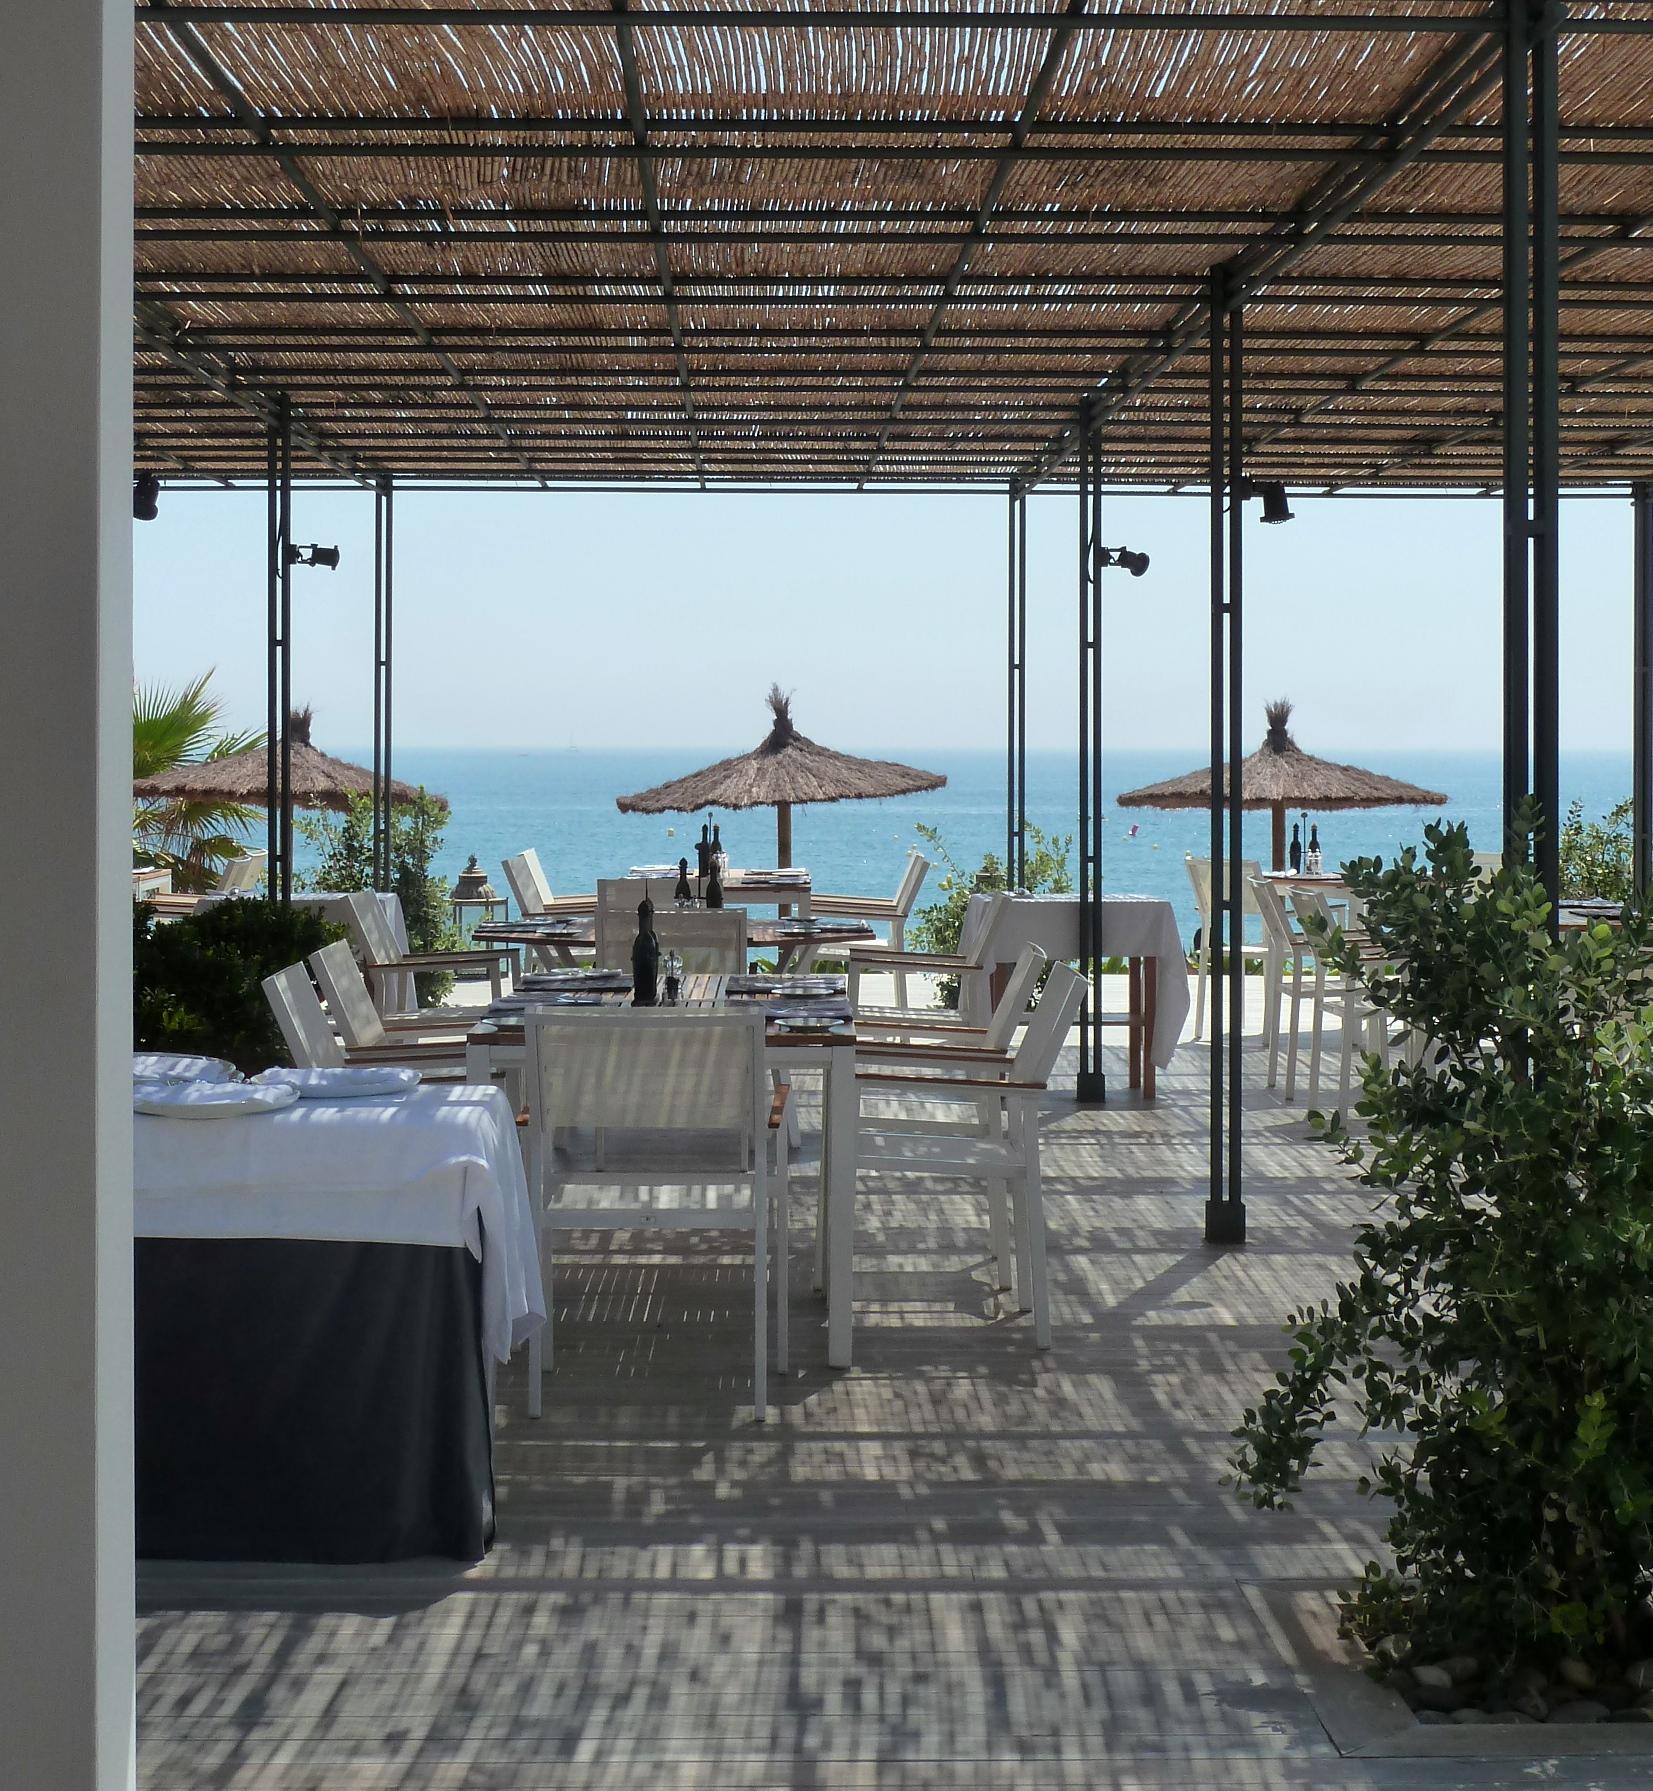 Terrace_Beach_Club_Finca_Cortesin_Bahia_Casares_copyright_www.andrewforbes.com